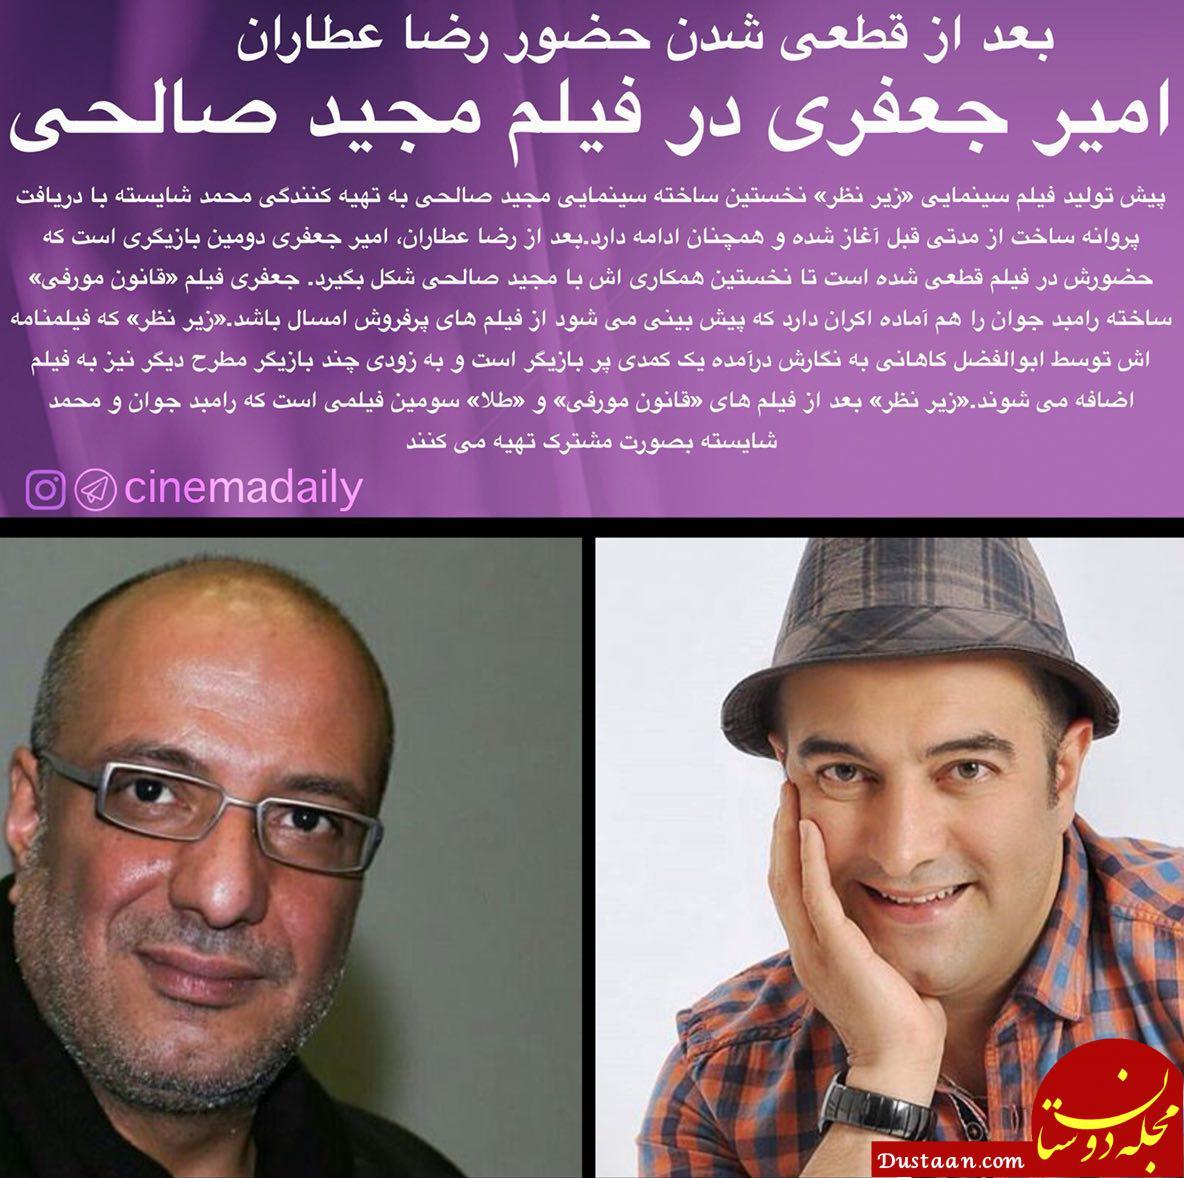 www.dustaan.com حضور امیر جعفری در فیلم مجید صالحی +عکس